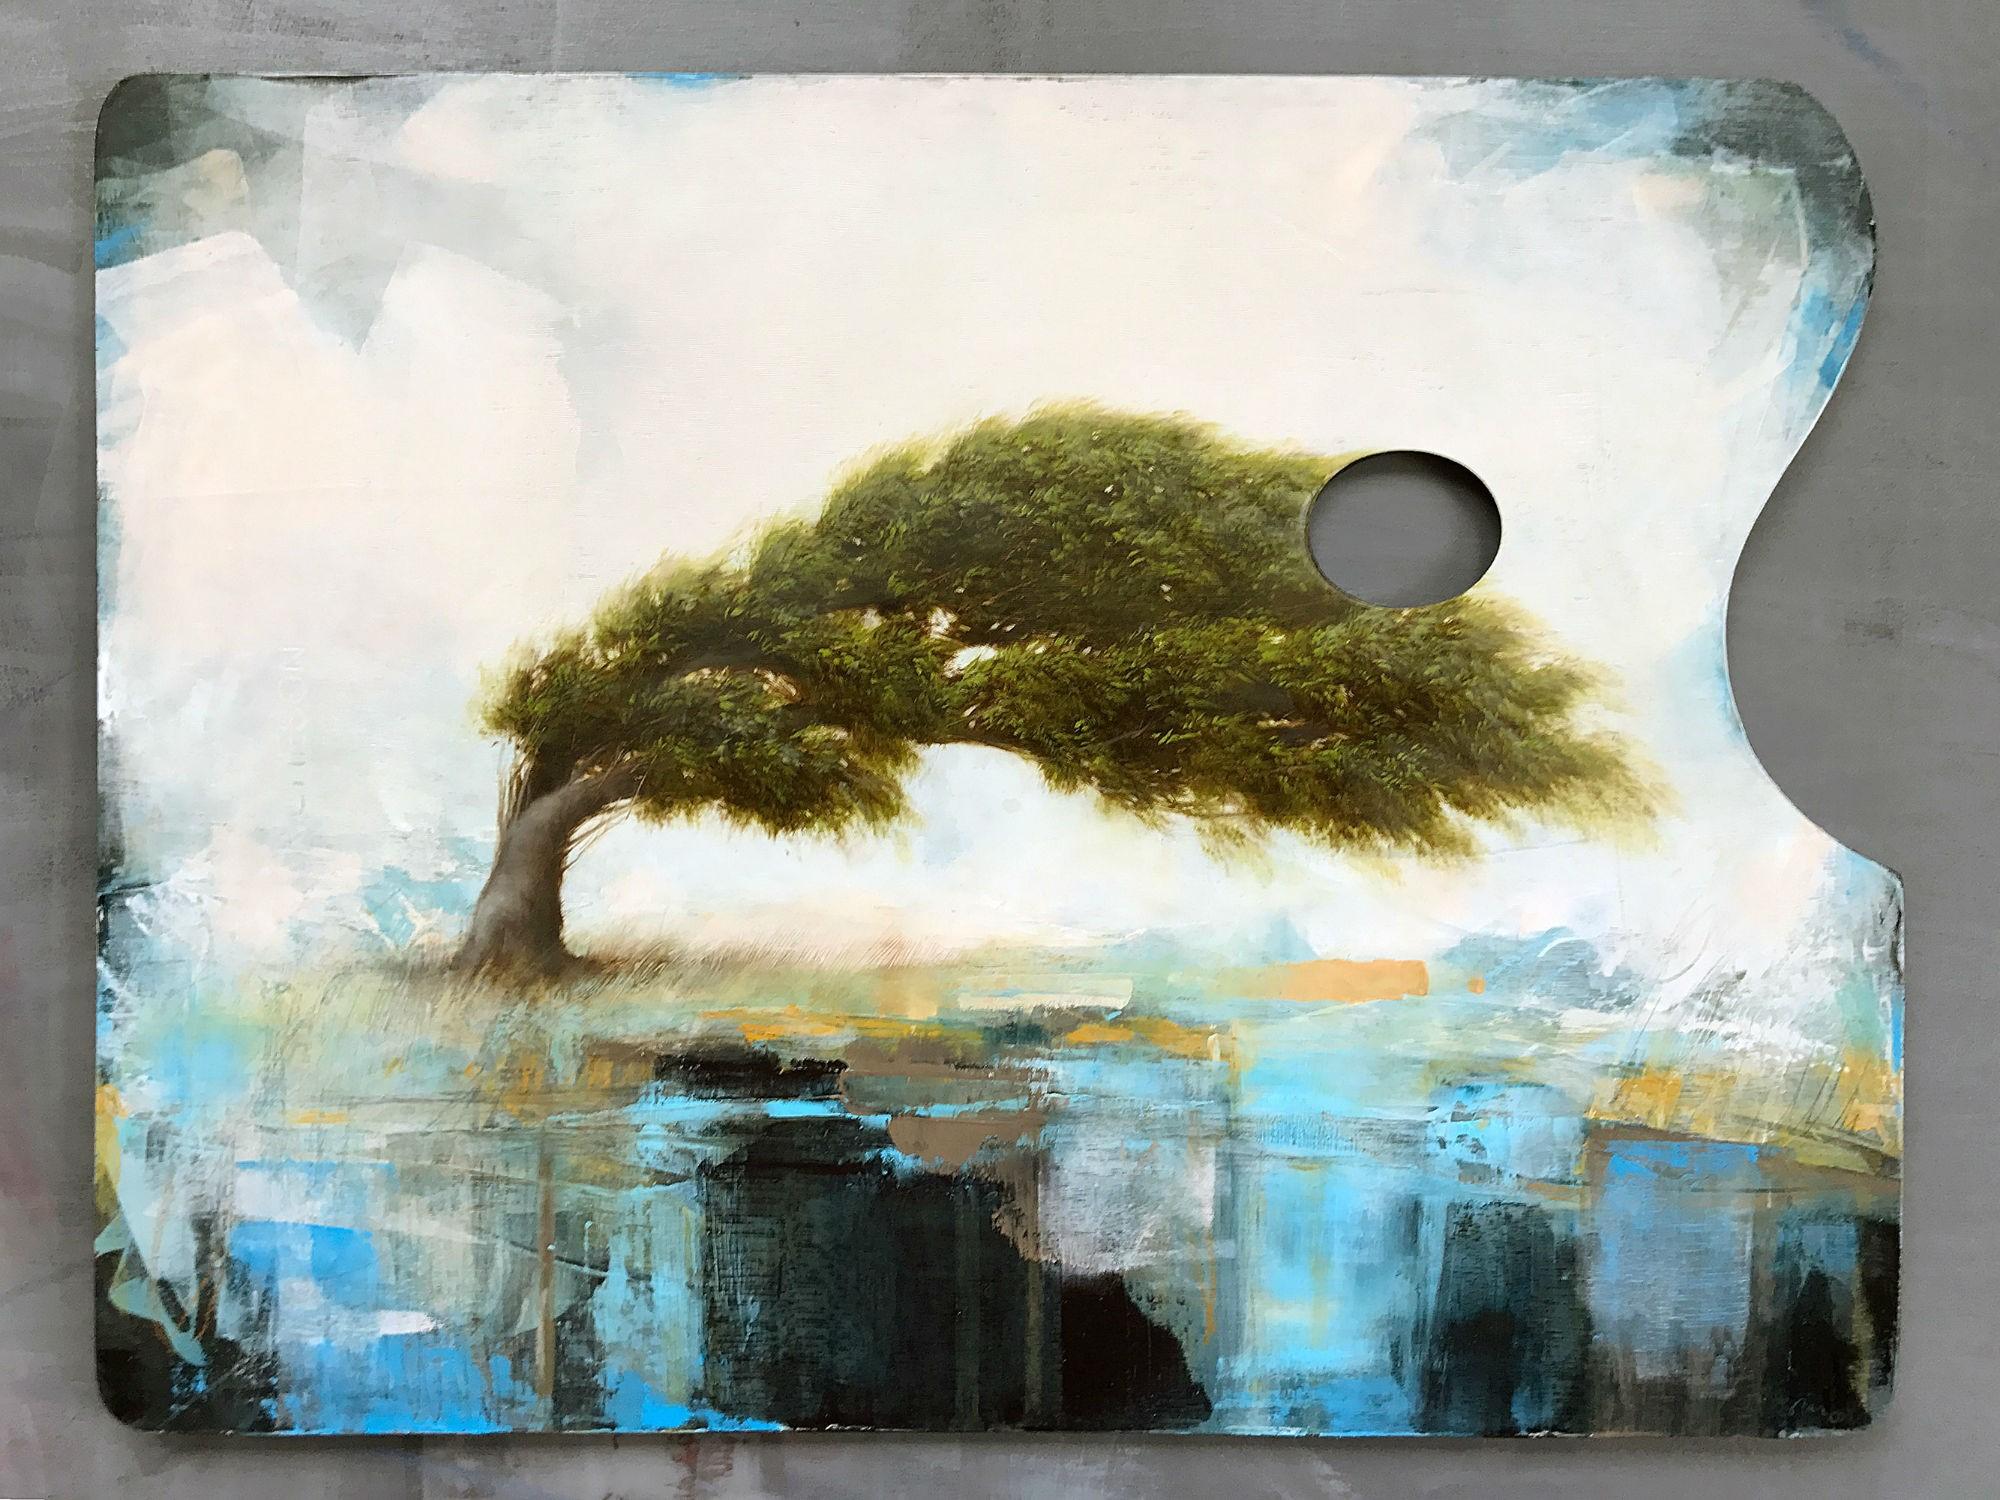 Solstice by Jessica Pisano